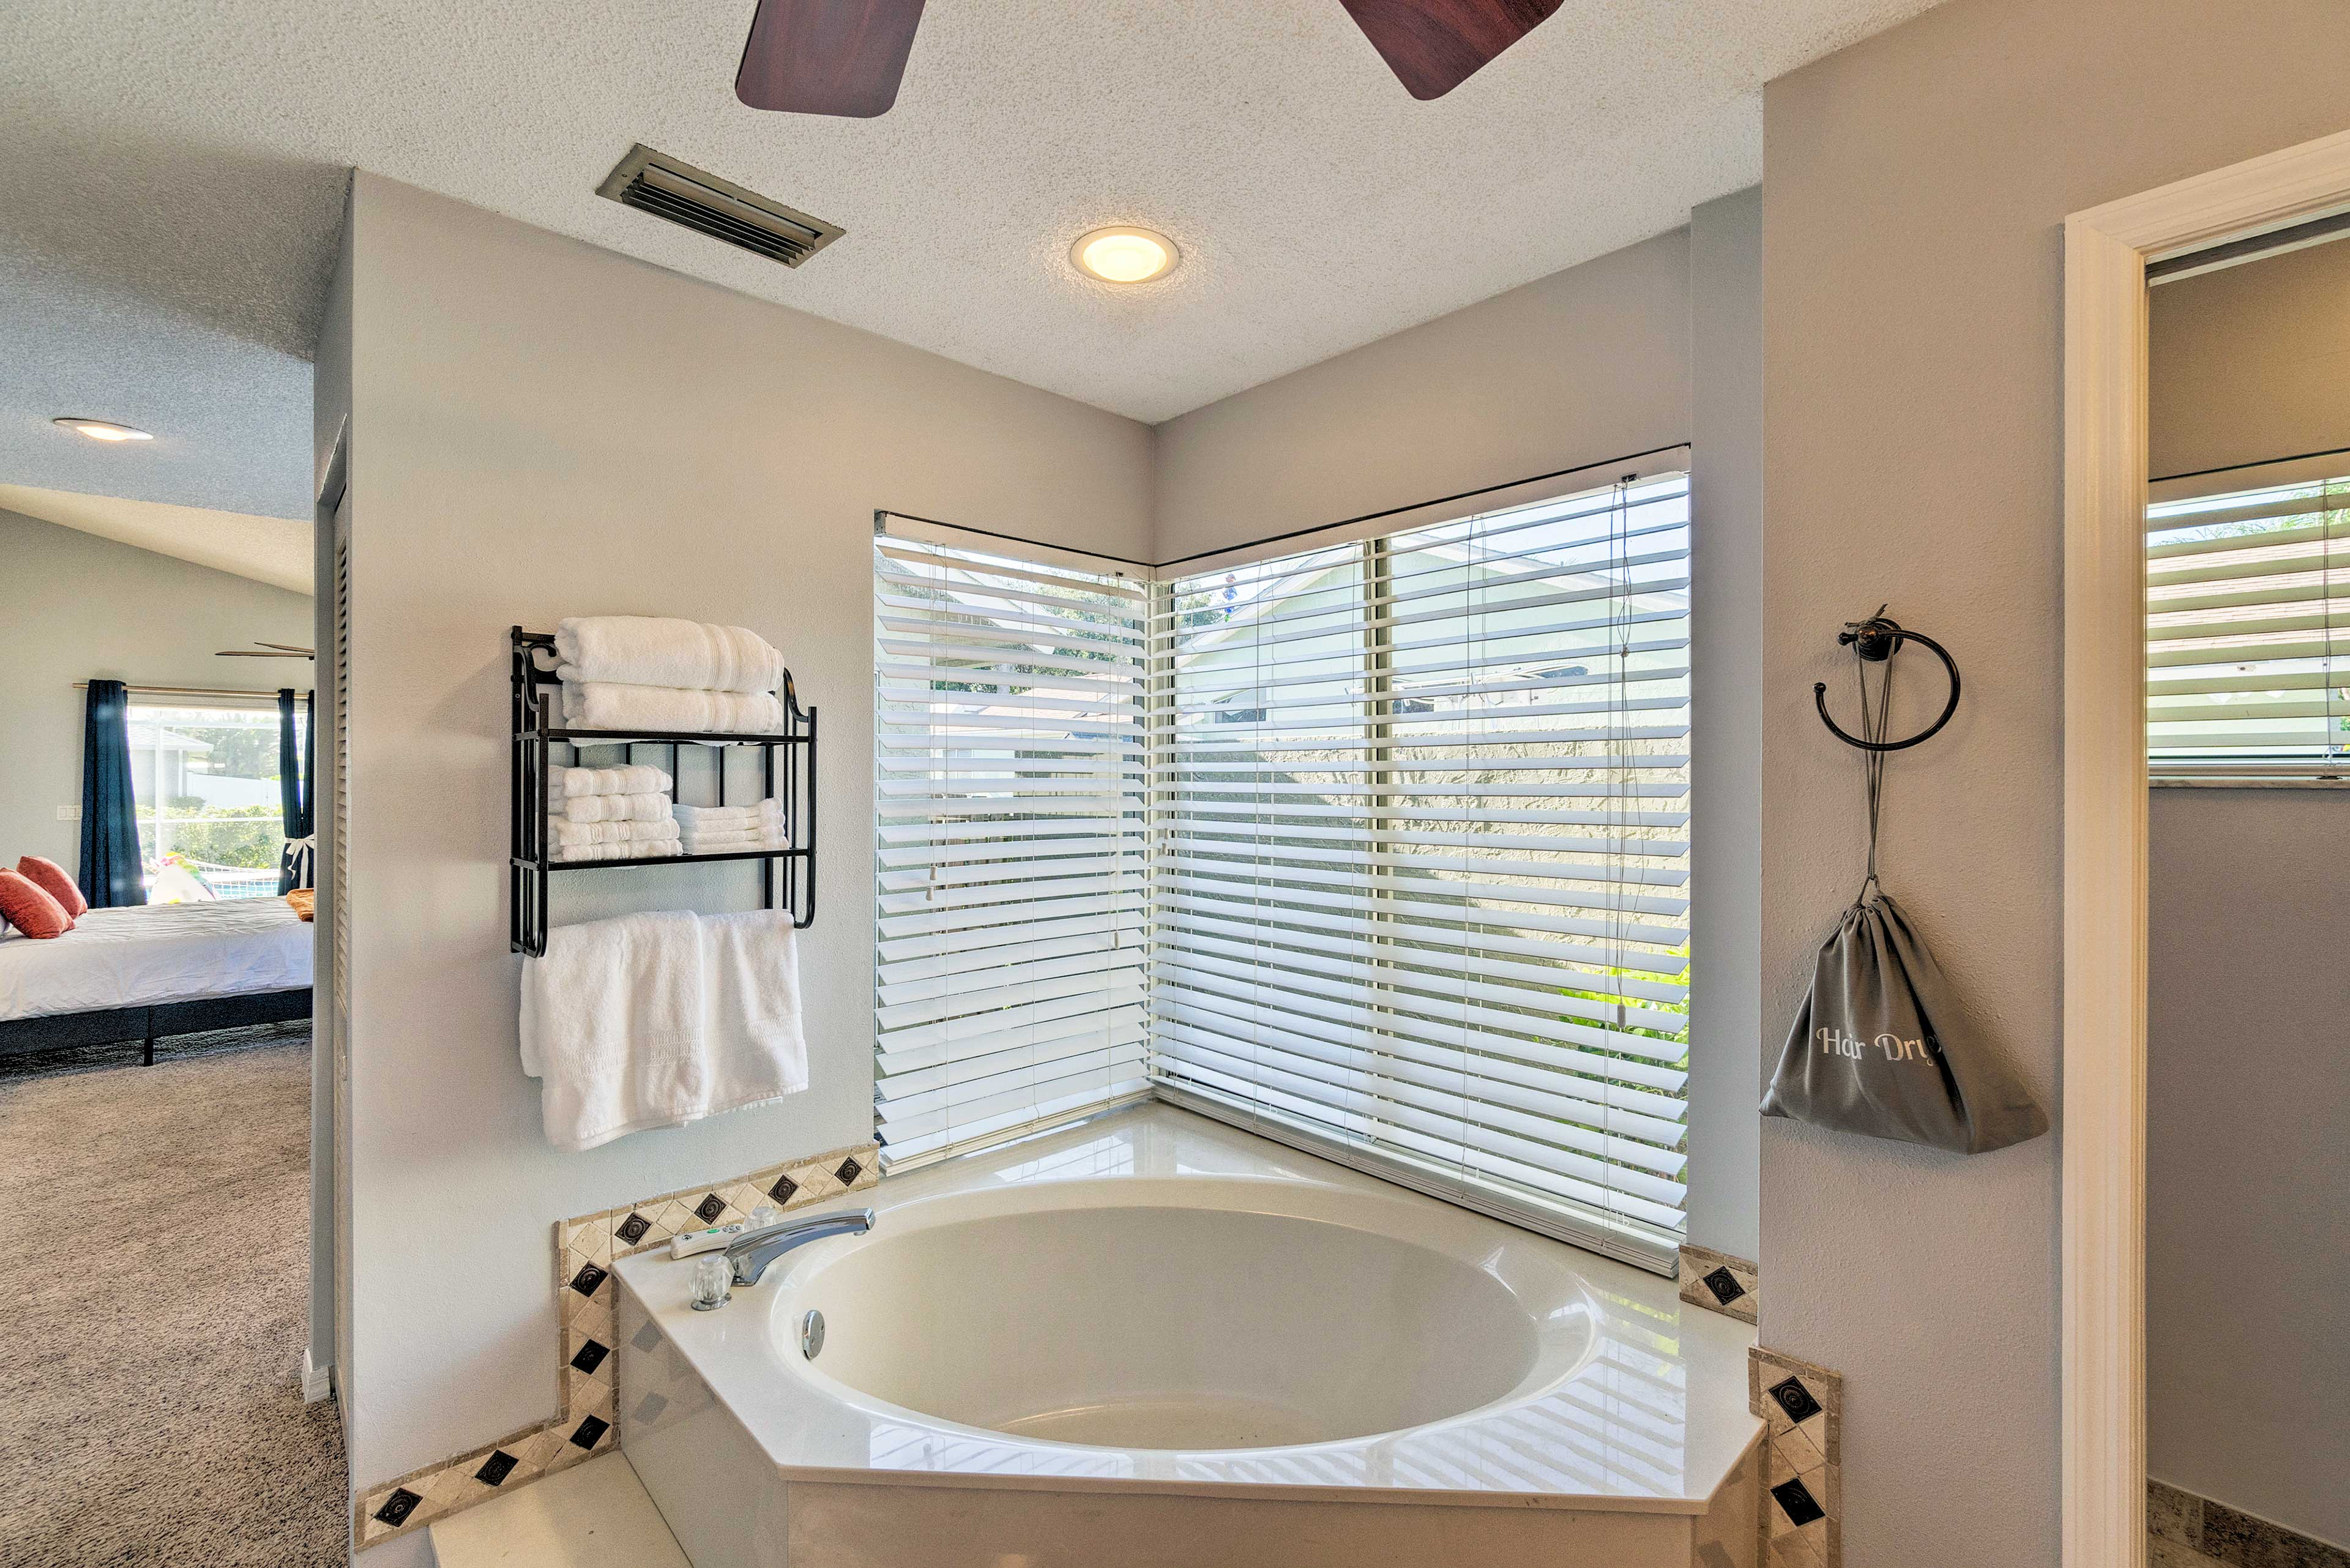 Enjoy a soothing soak in the garden tub.